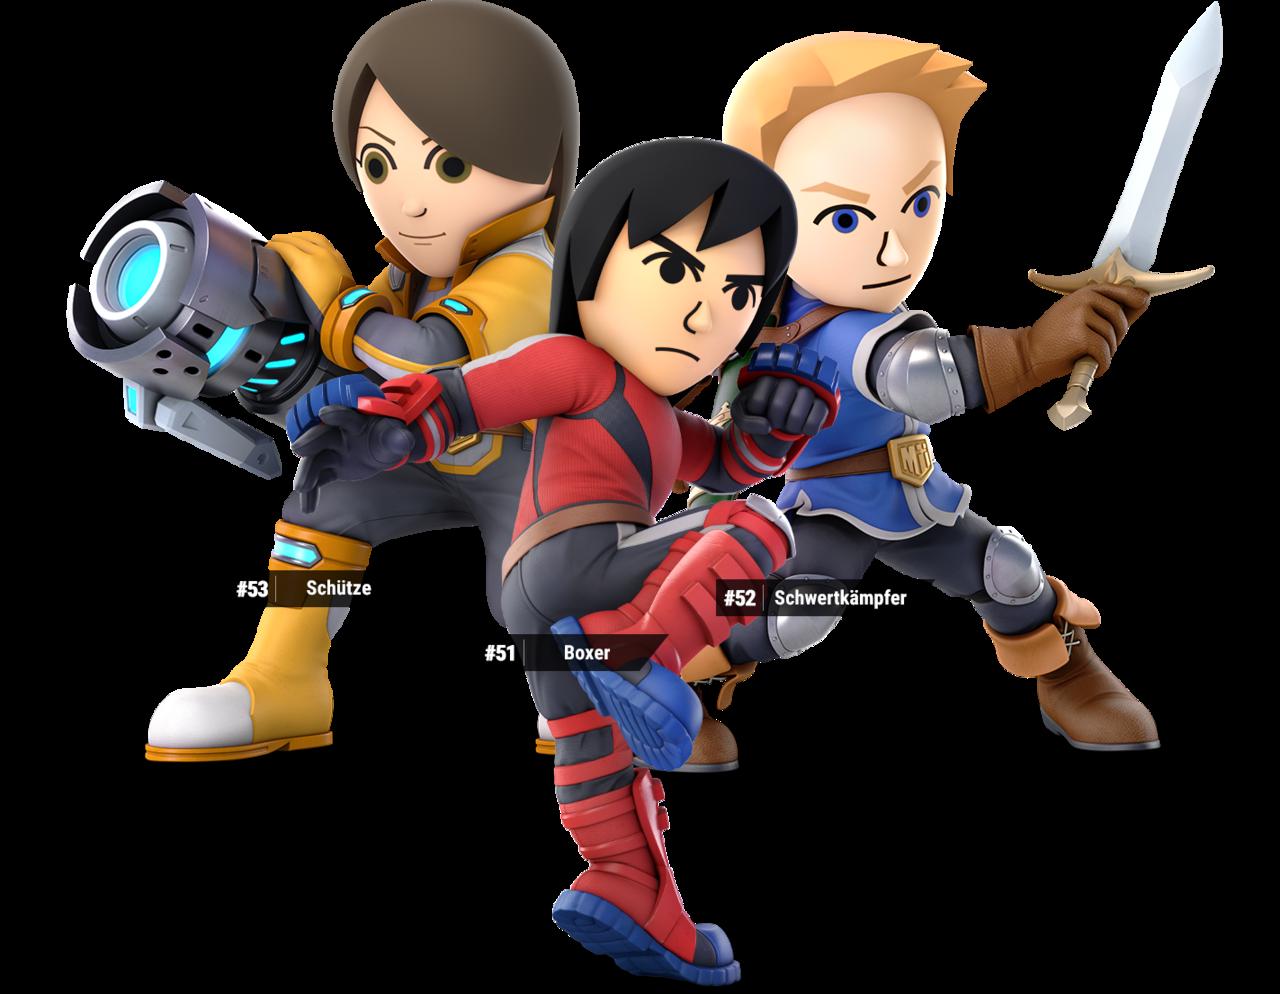 Mii Fighters in Super Smash Bros  Ultimate | Games | Super smash